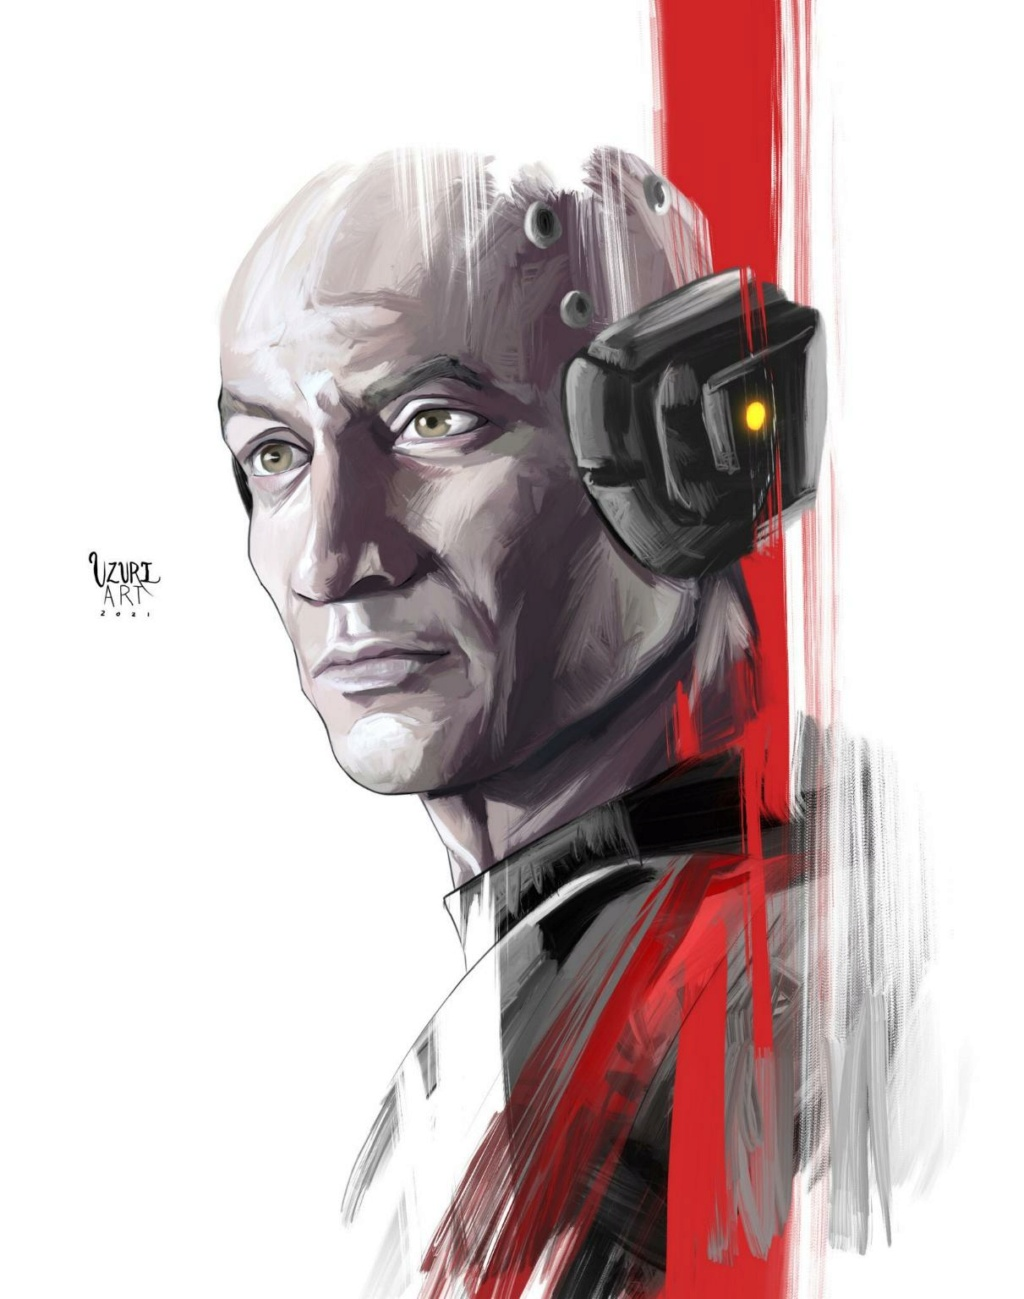 Digital Art par UZURI ART - Star Wars Uzuri_39